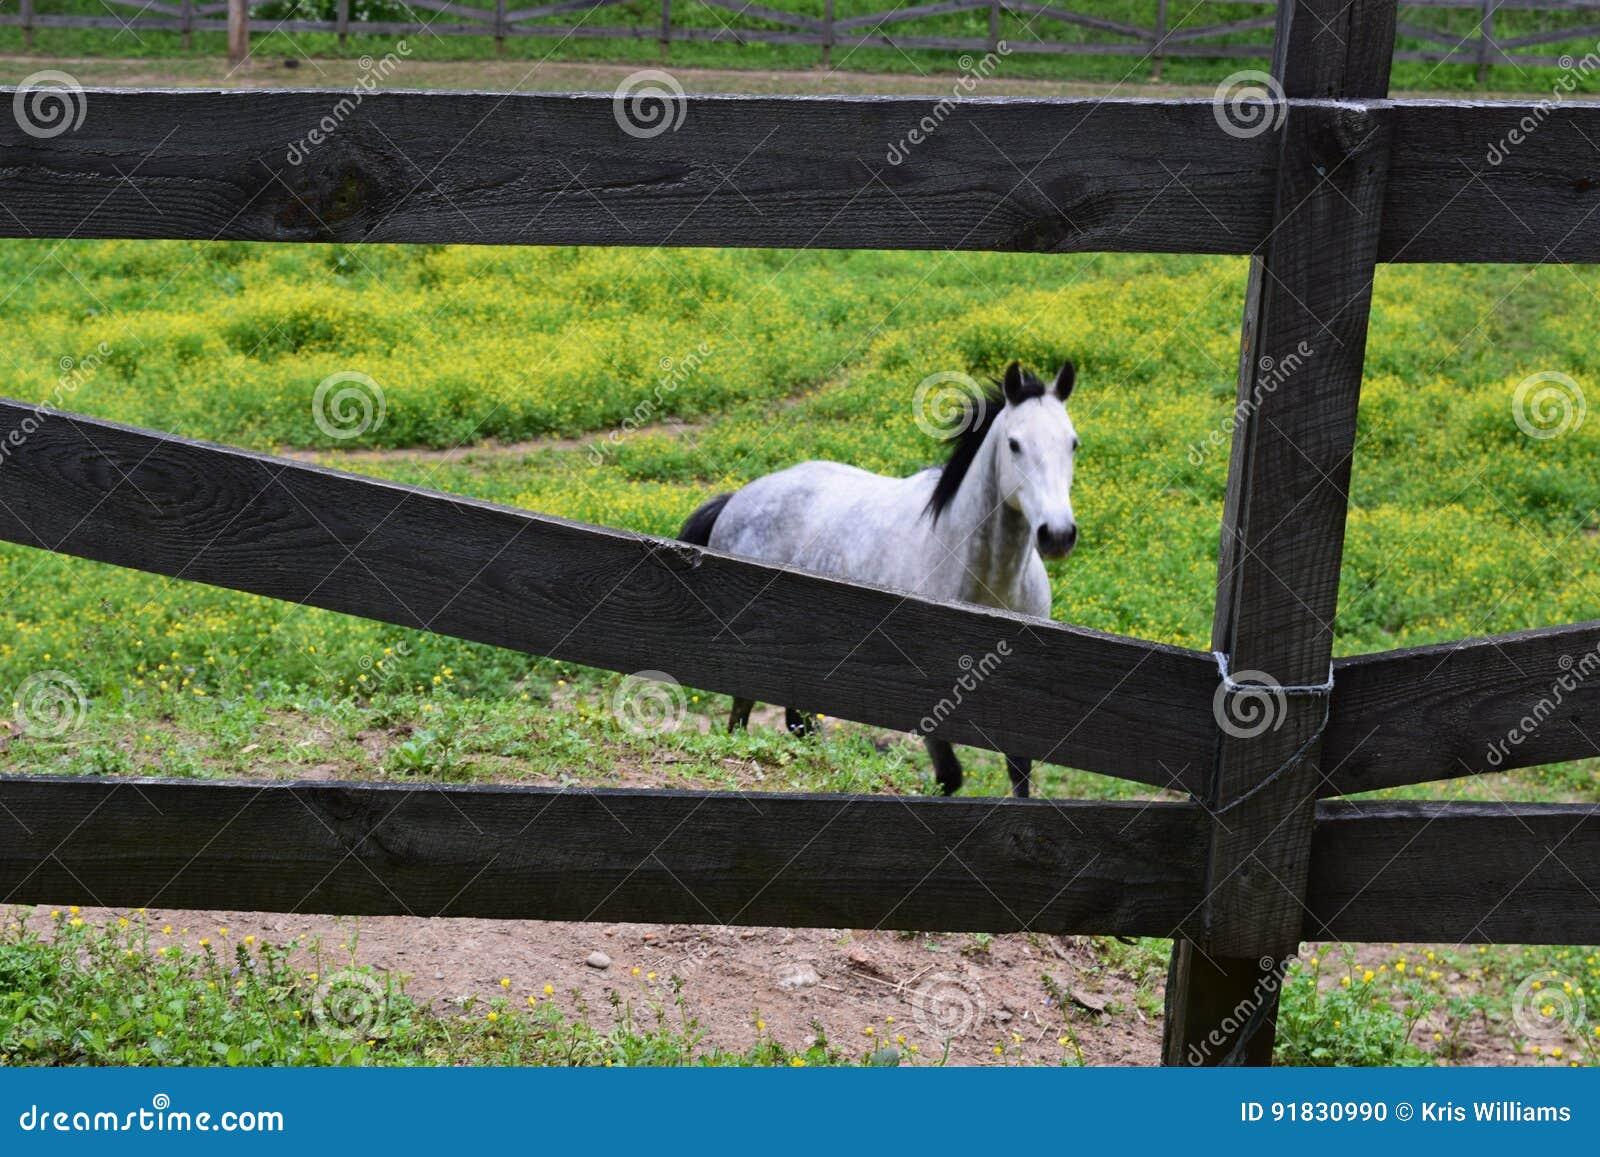 Western NC horse farm and wood fence